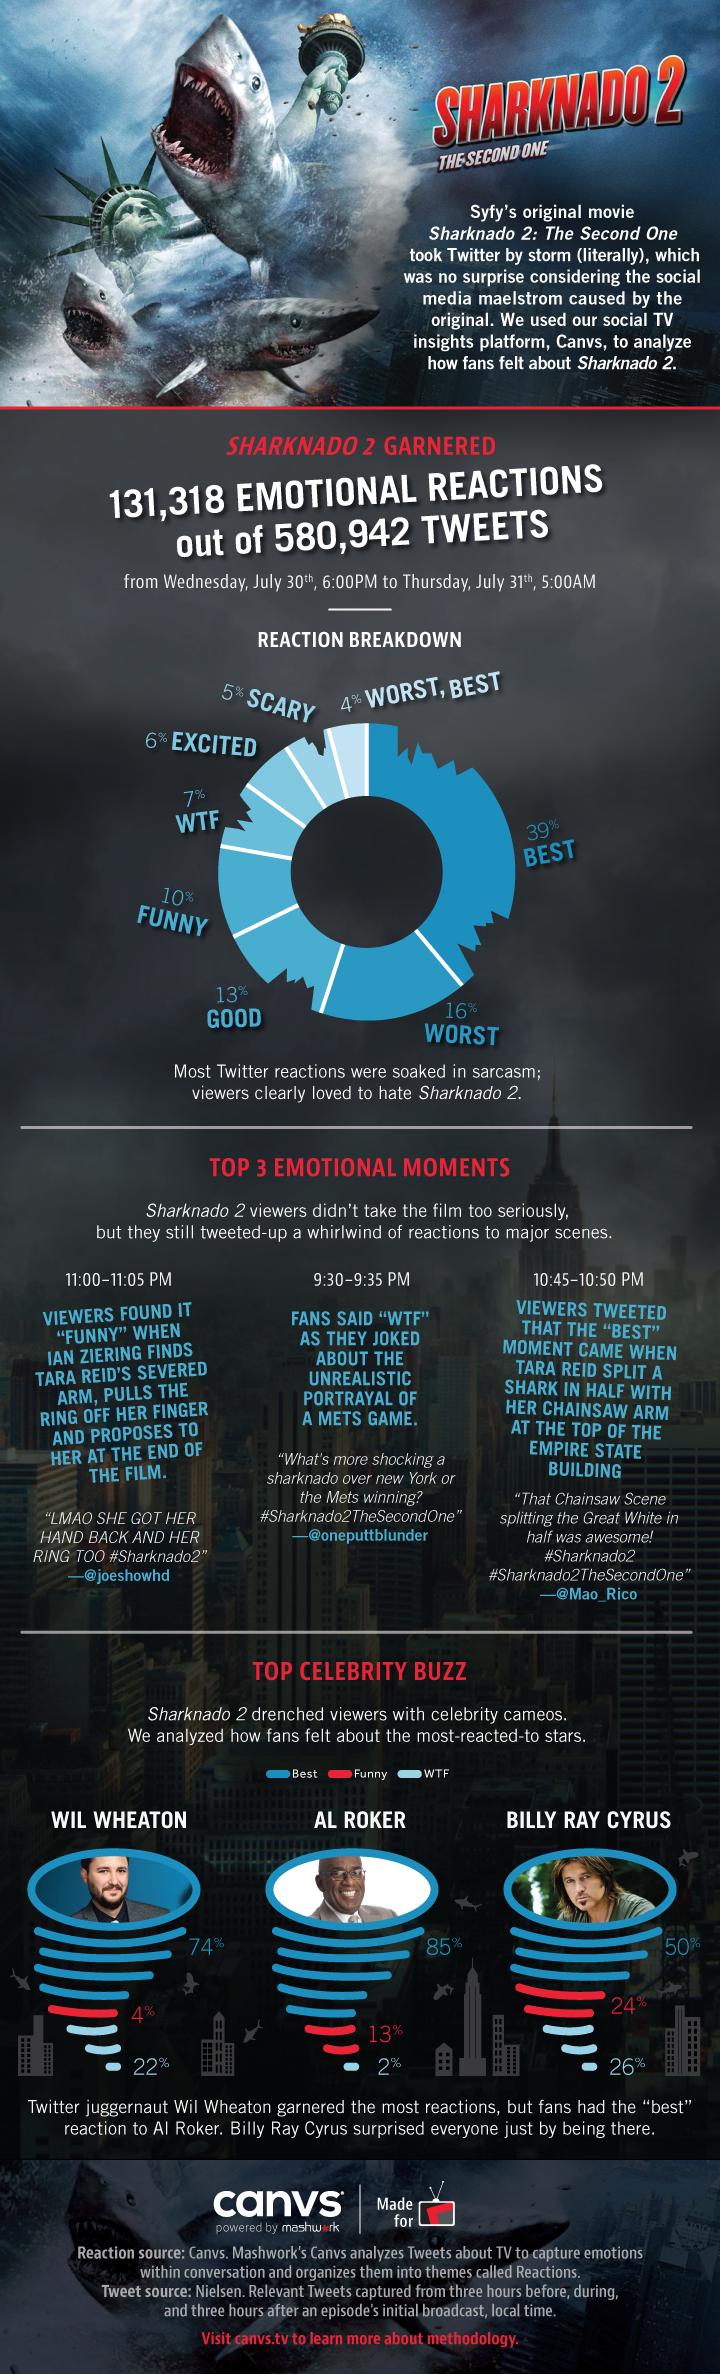 Sharknado 2 Infographic